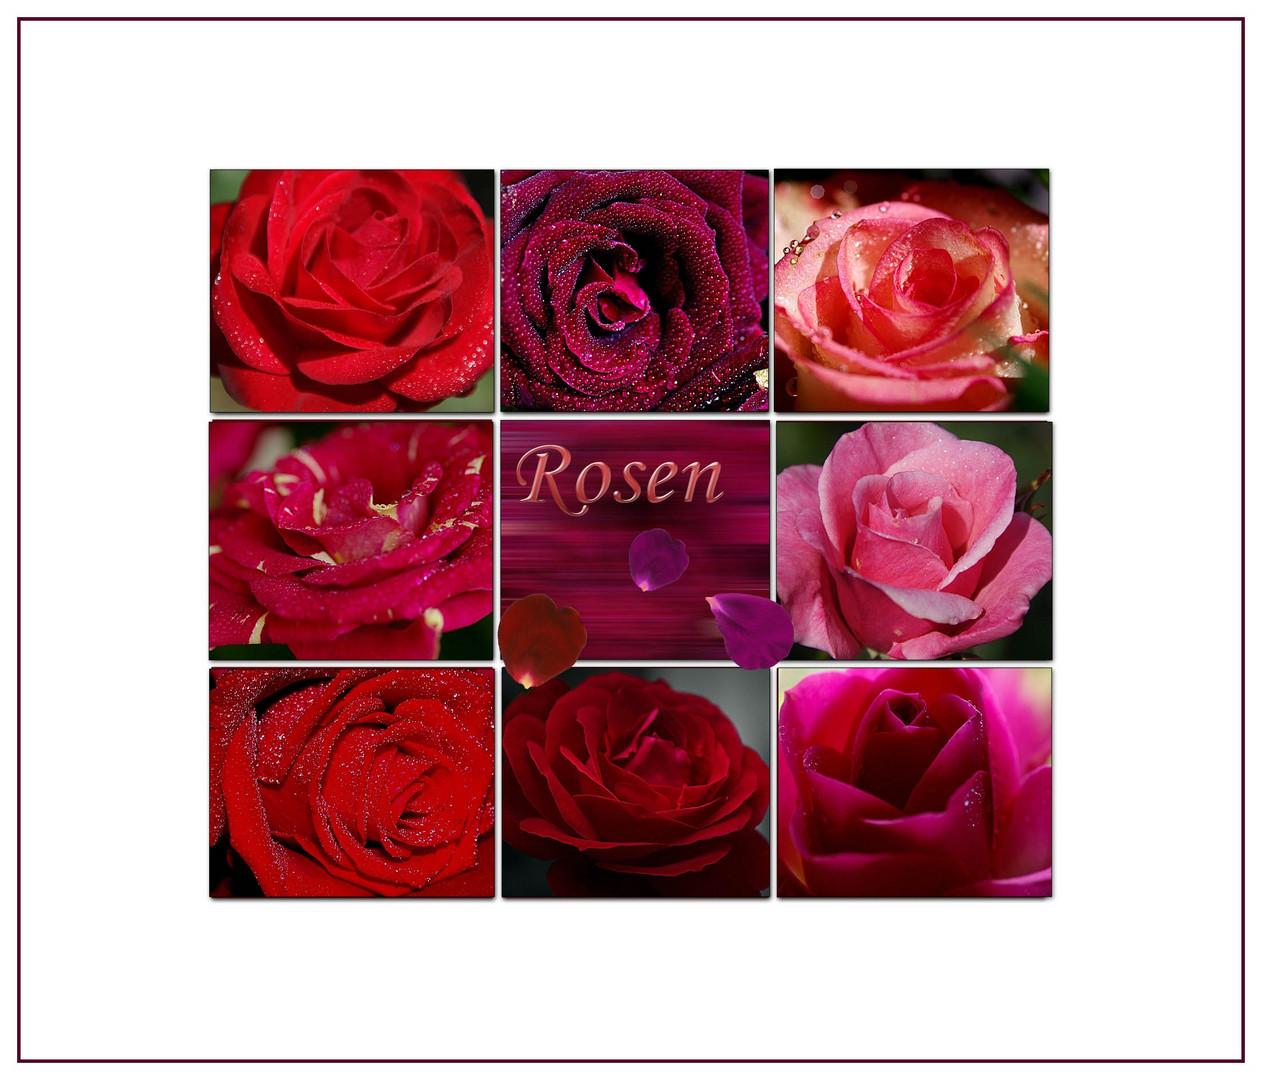 Rosenzauber die Erste